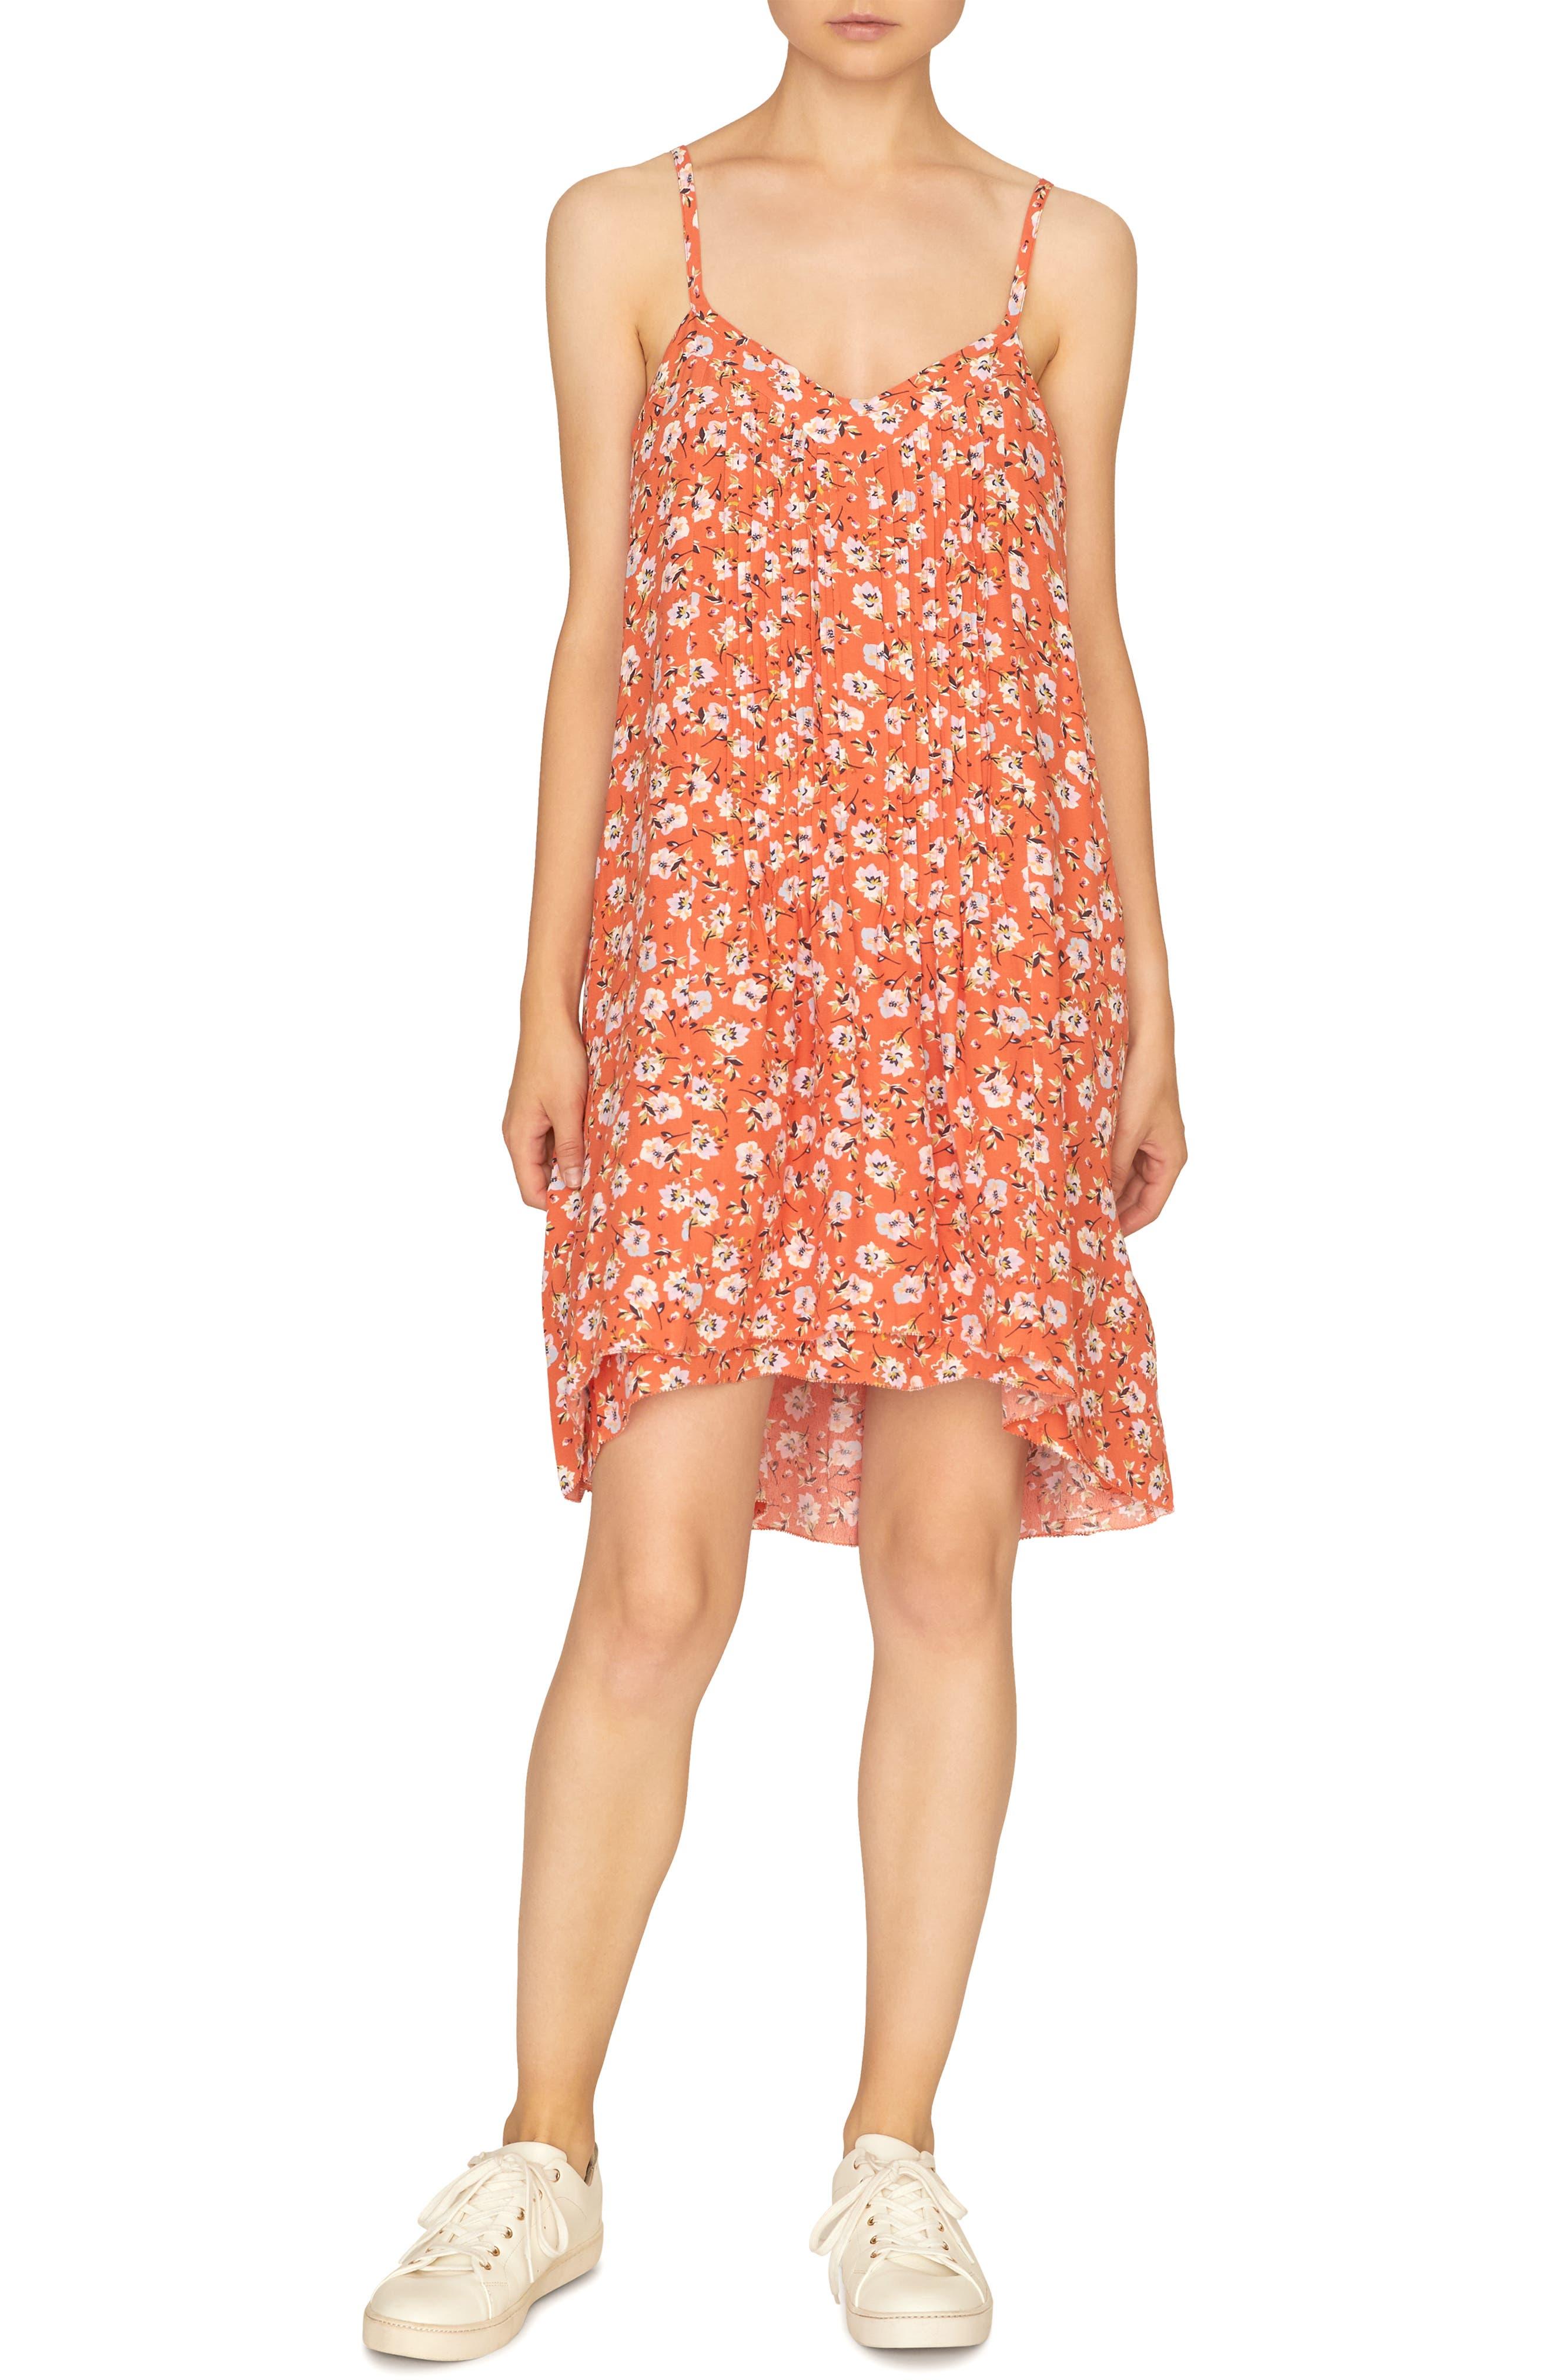 Sanctuary Spring Ahead Tank Dress, Orange